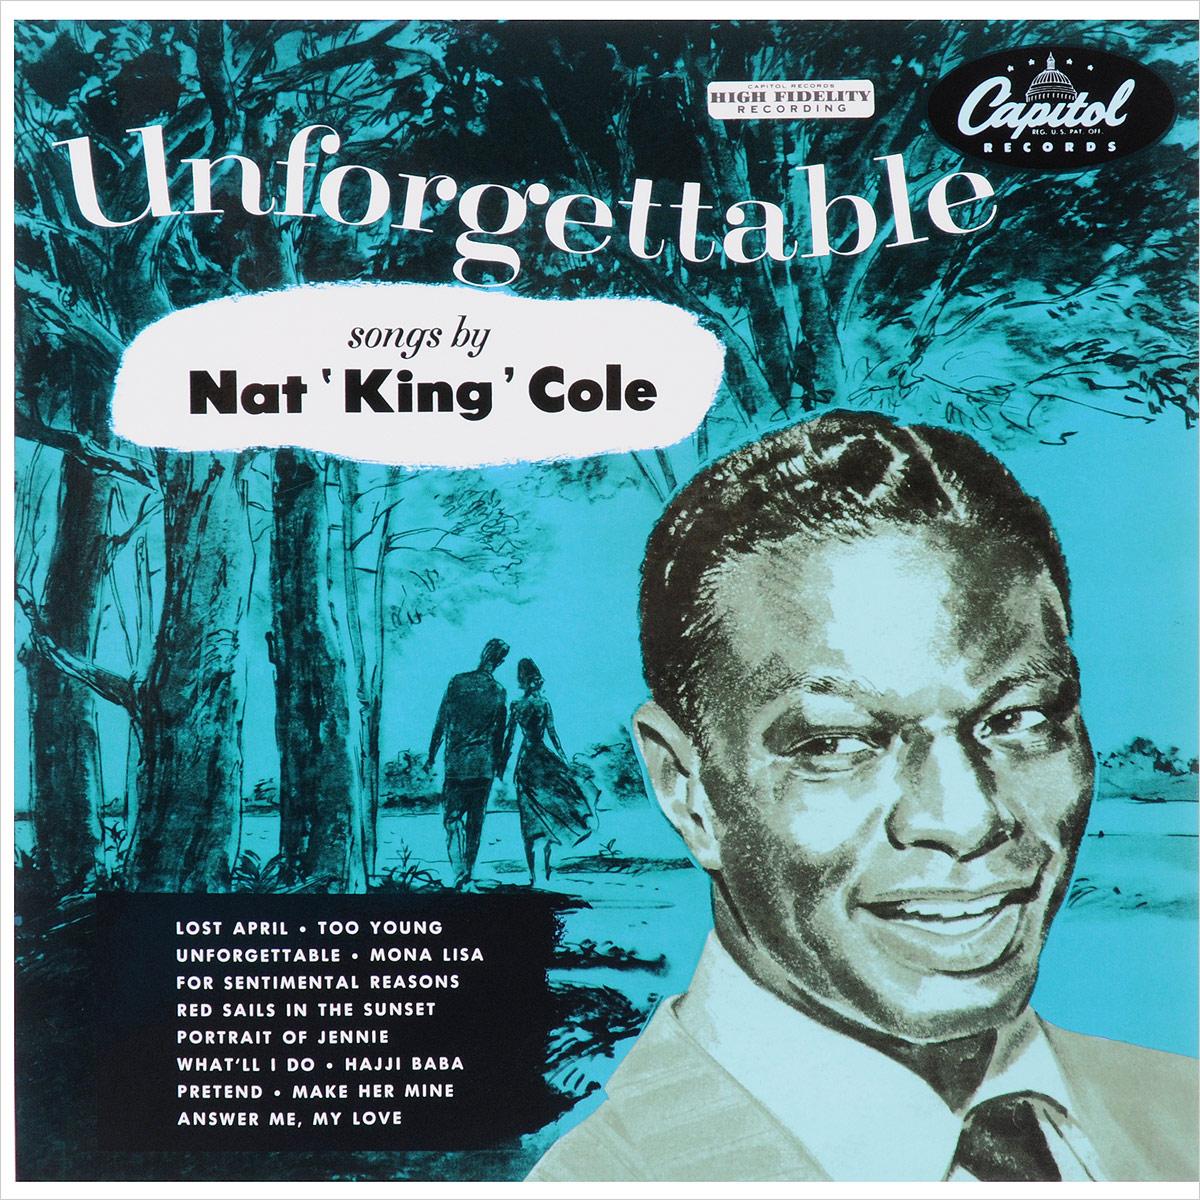 Нэт Кинг Коул Nat King Cole. Unforgettable (LP) nat king cole nat king cole the platinum collection 3 lp